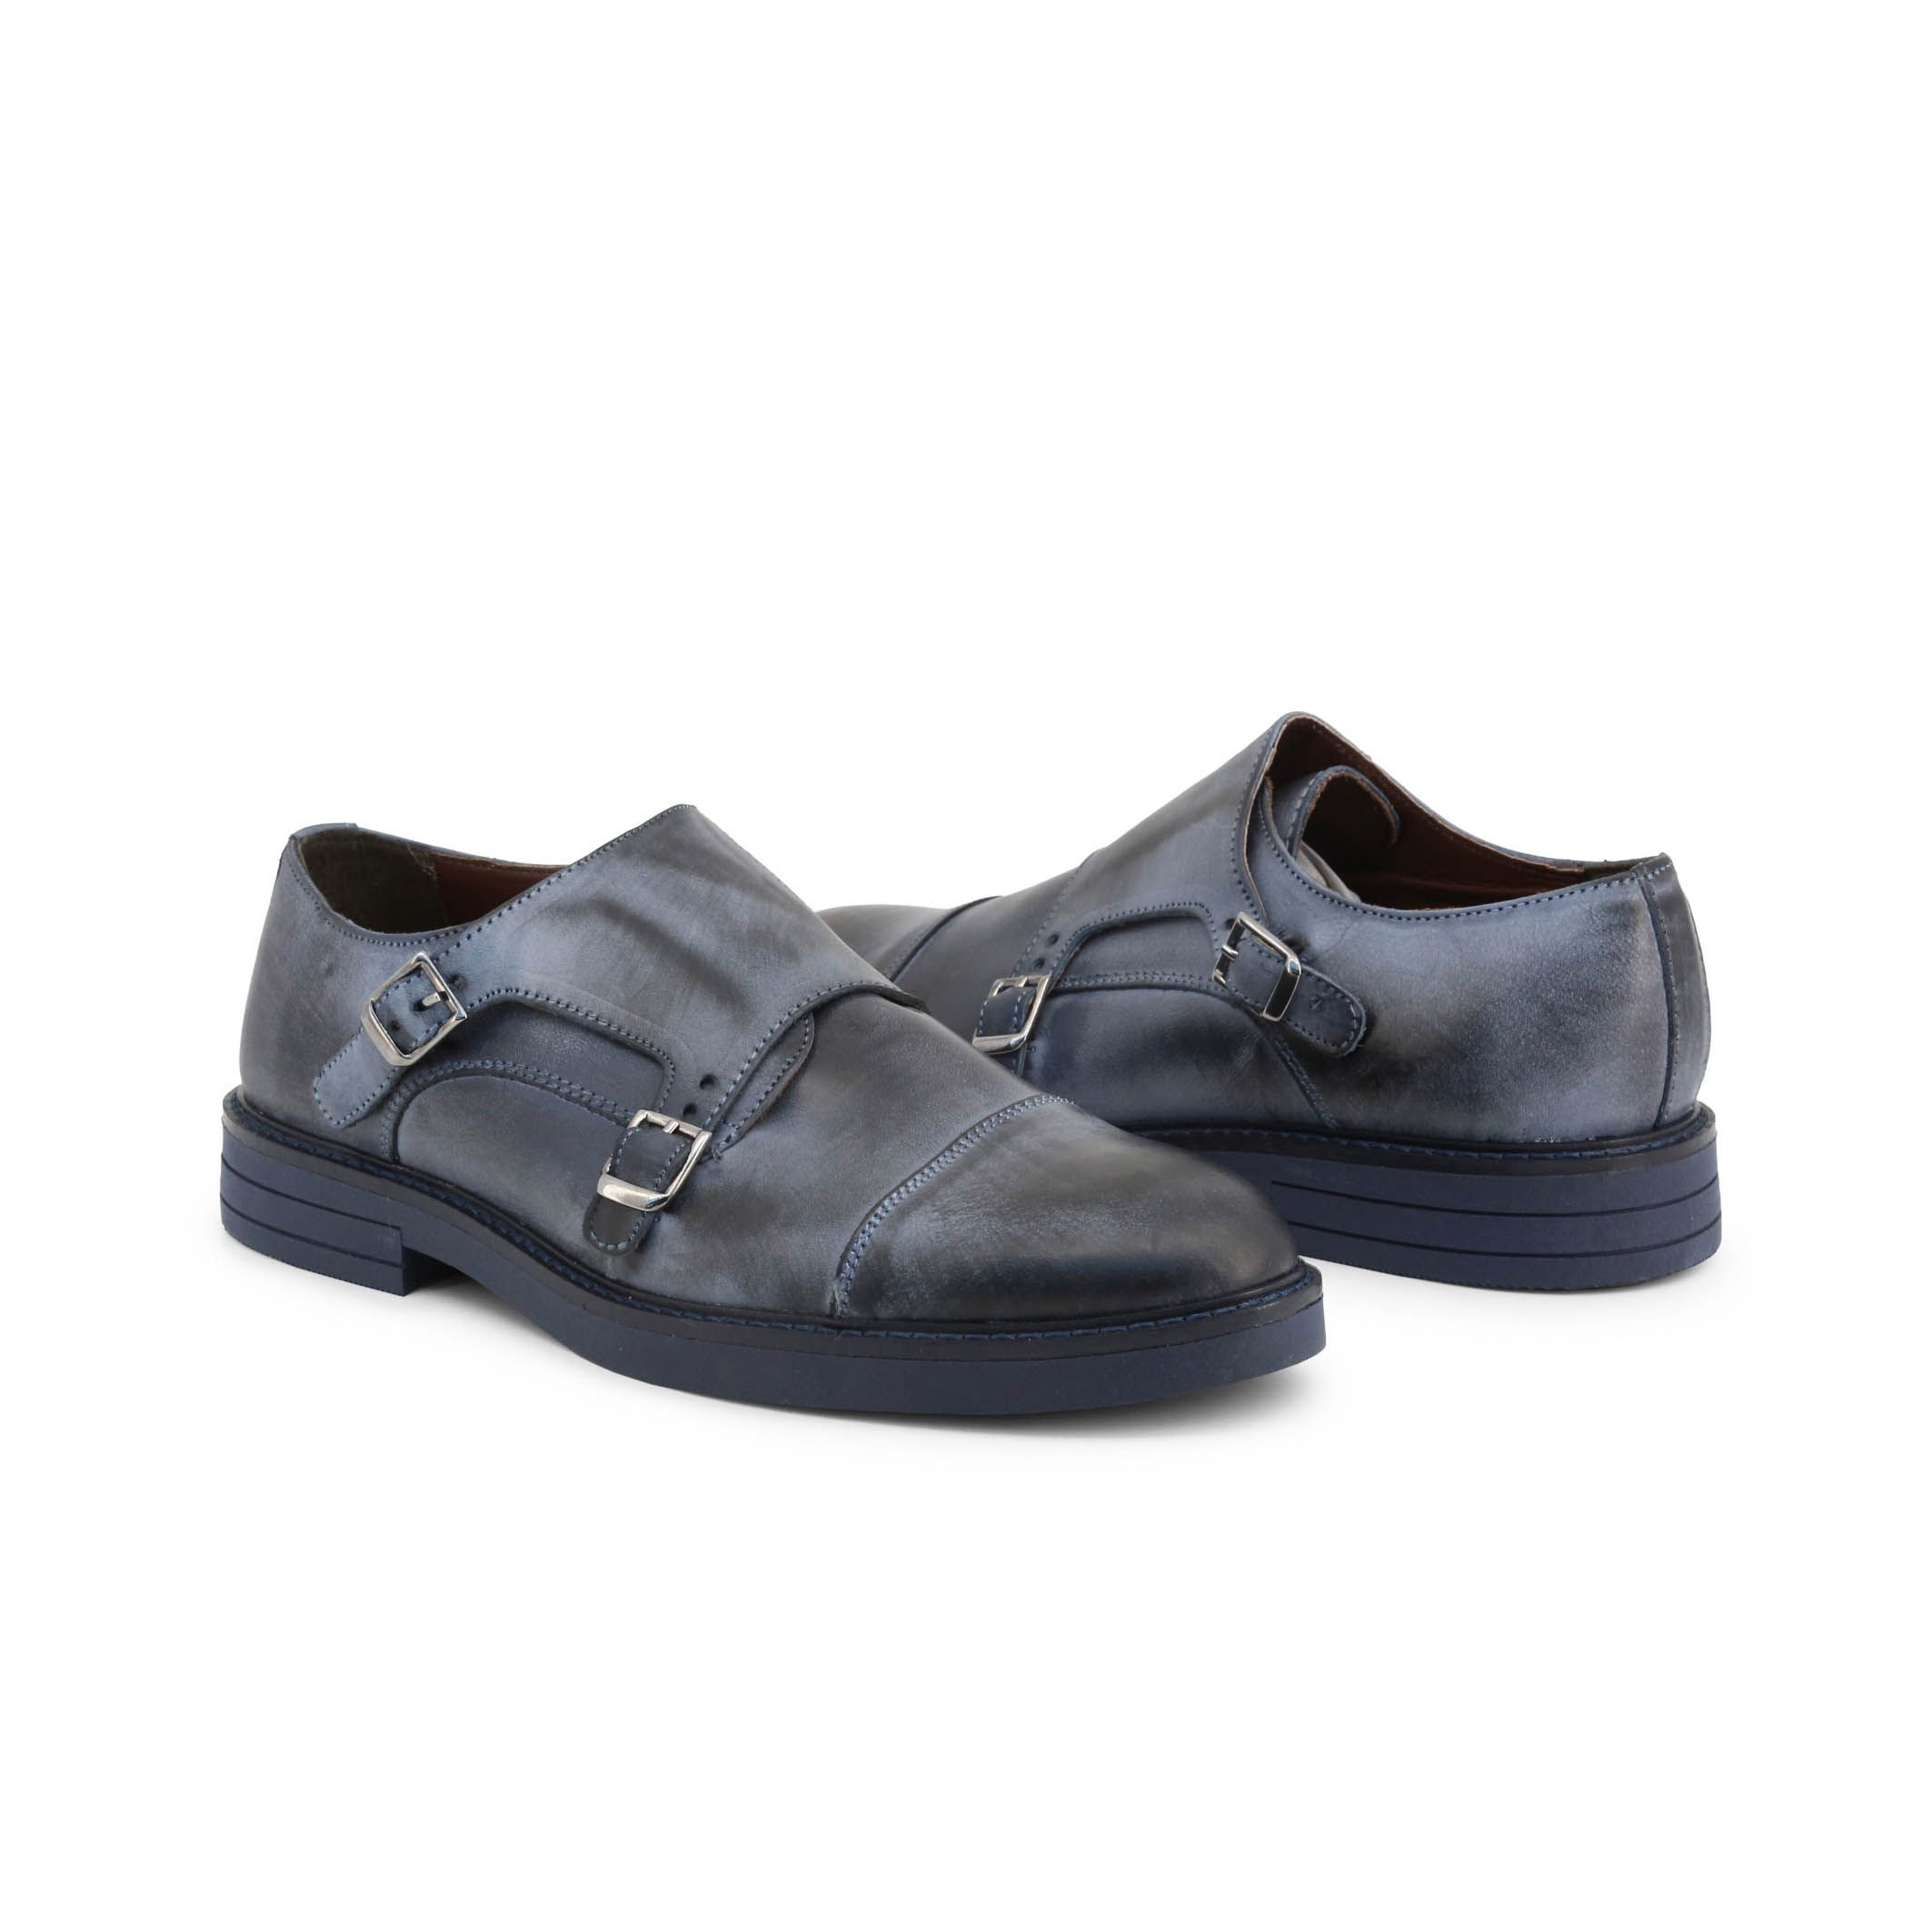 Chaussures classiques Madrid – CL600_PELLE